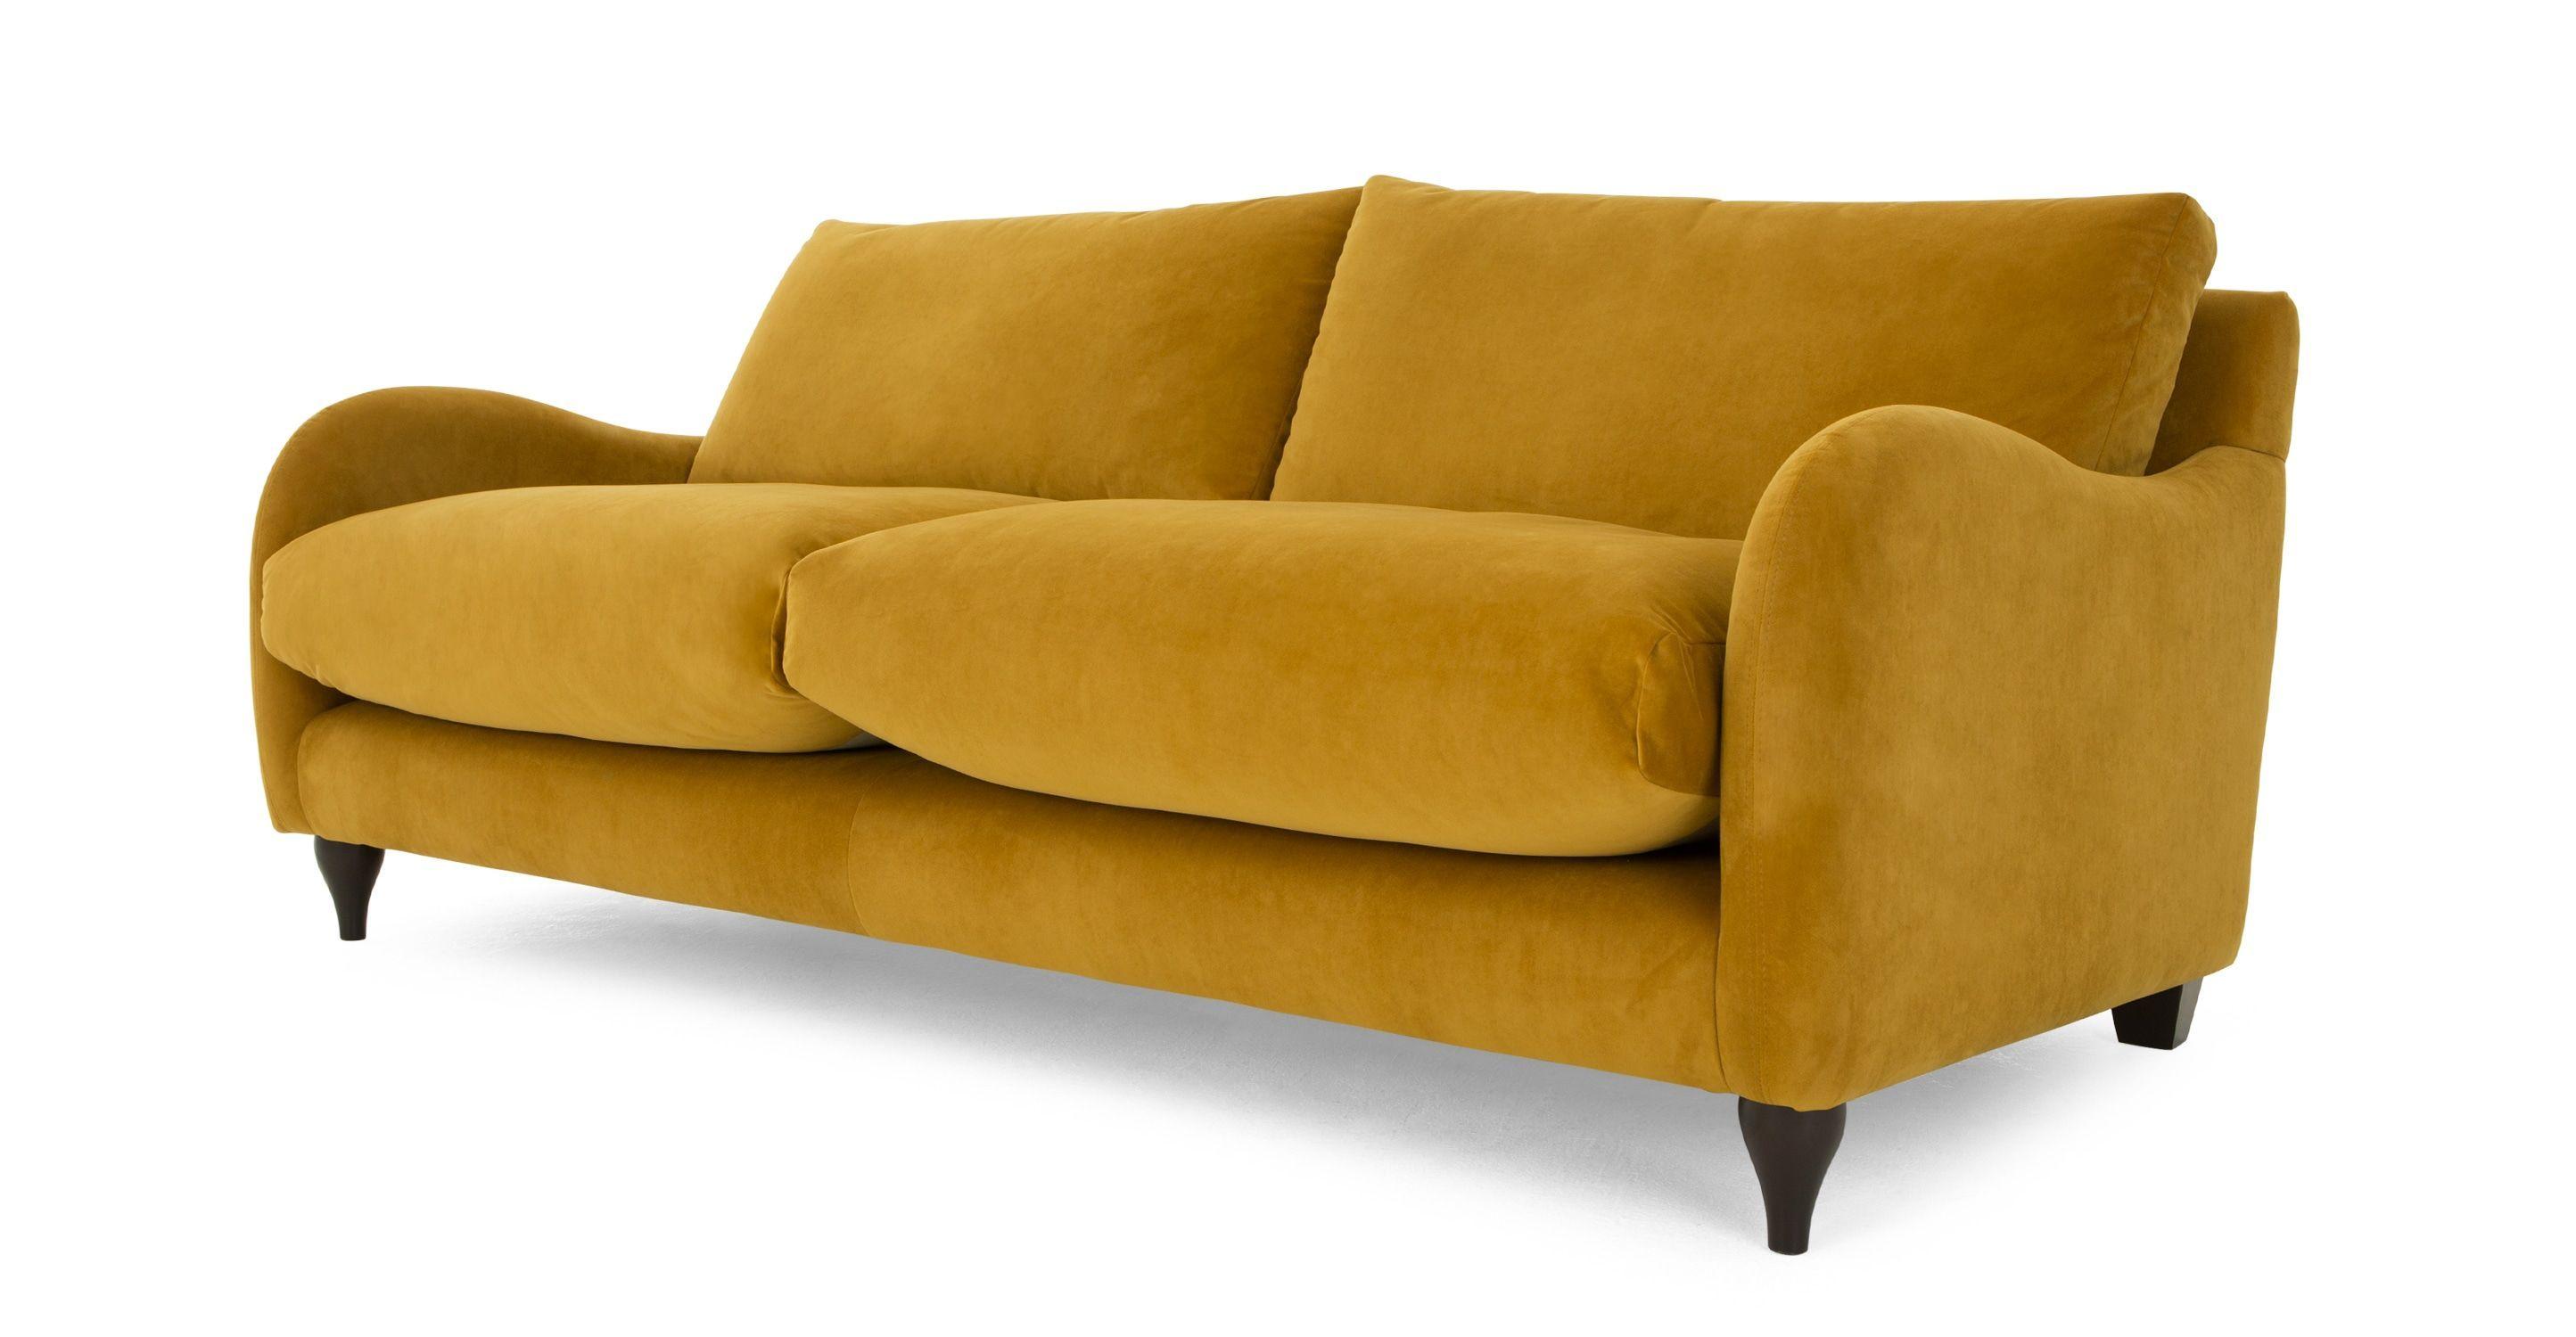 27 Schone Plaid Sofa Und Loveseat Sofa Kariertes Sofa 2 Sitzer